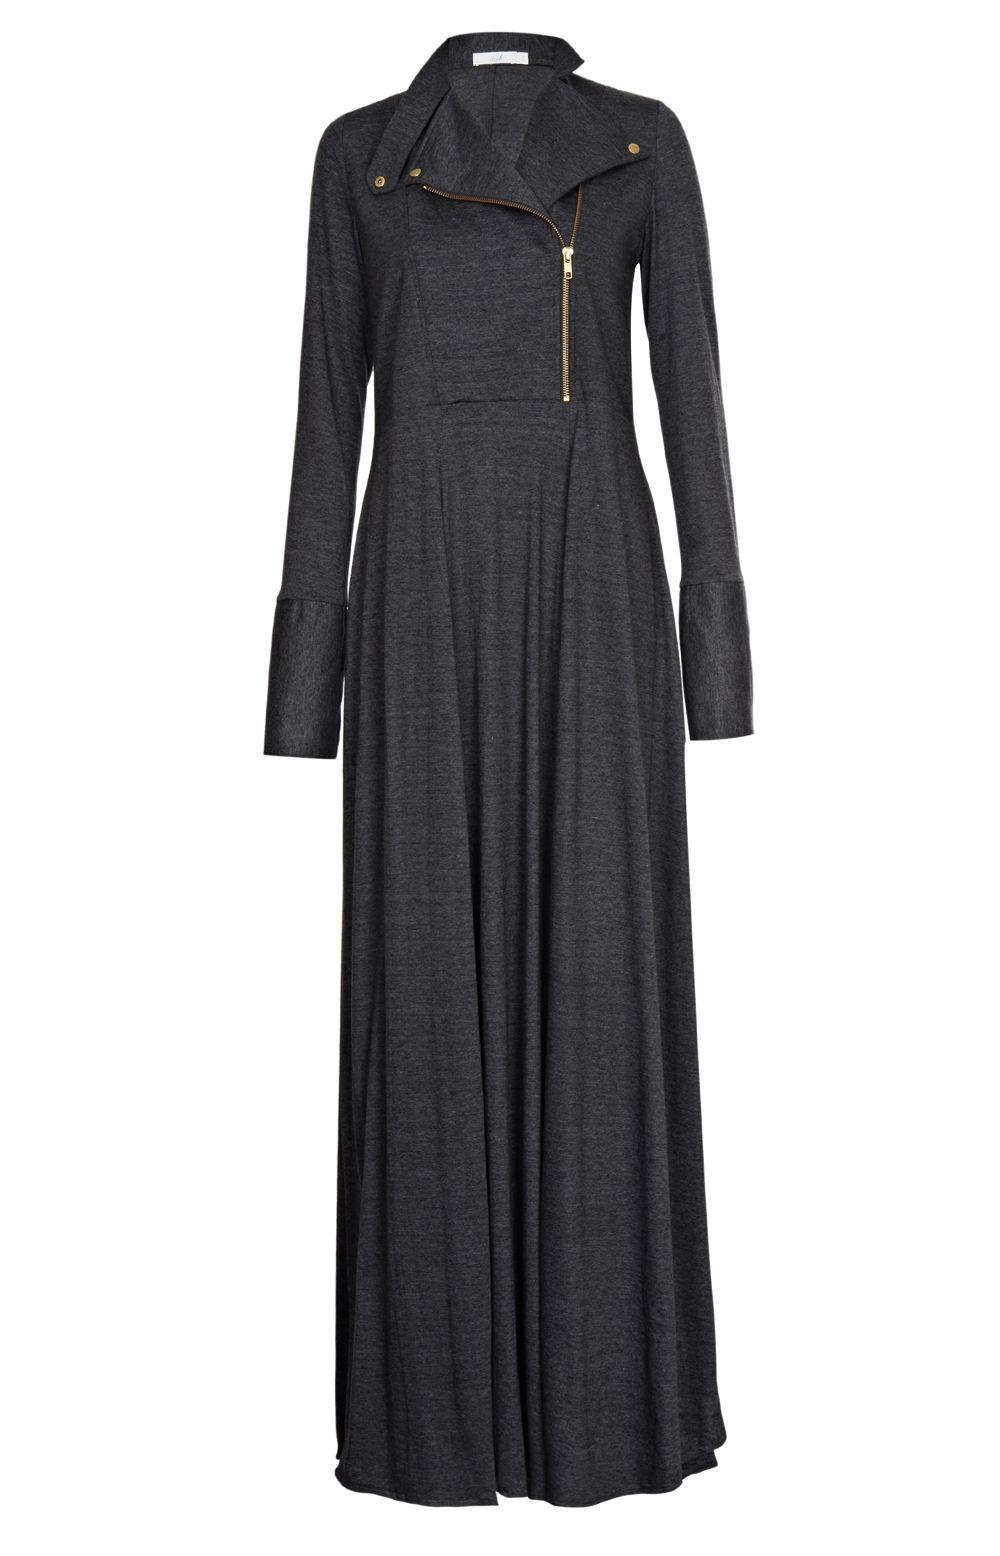 Aab UK Carbon Kawasaki Abaya : Standard view | Hijab ...